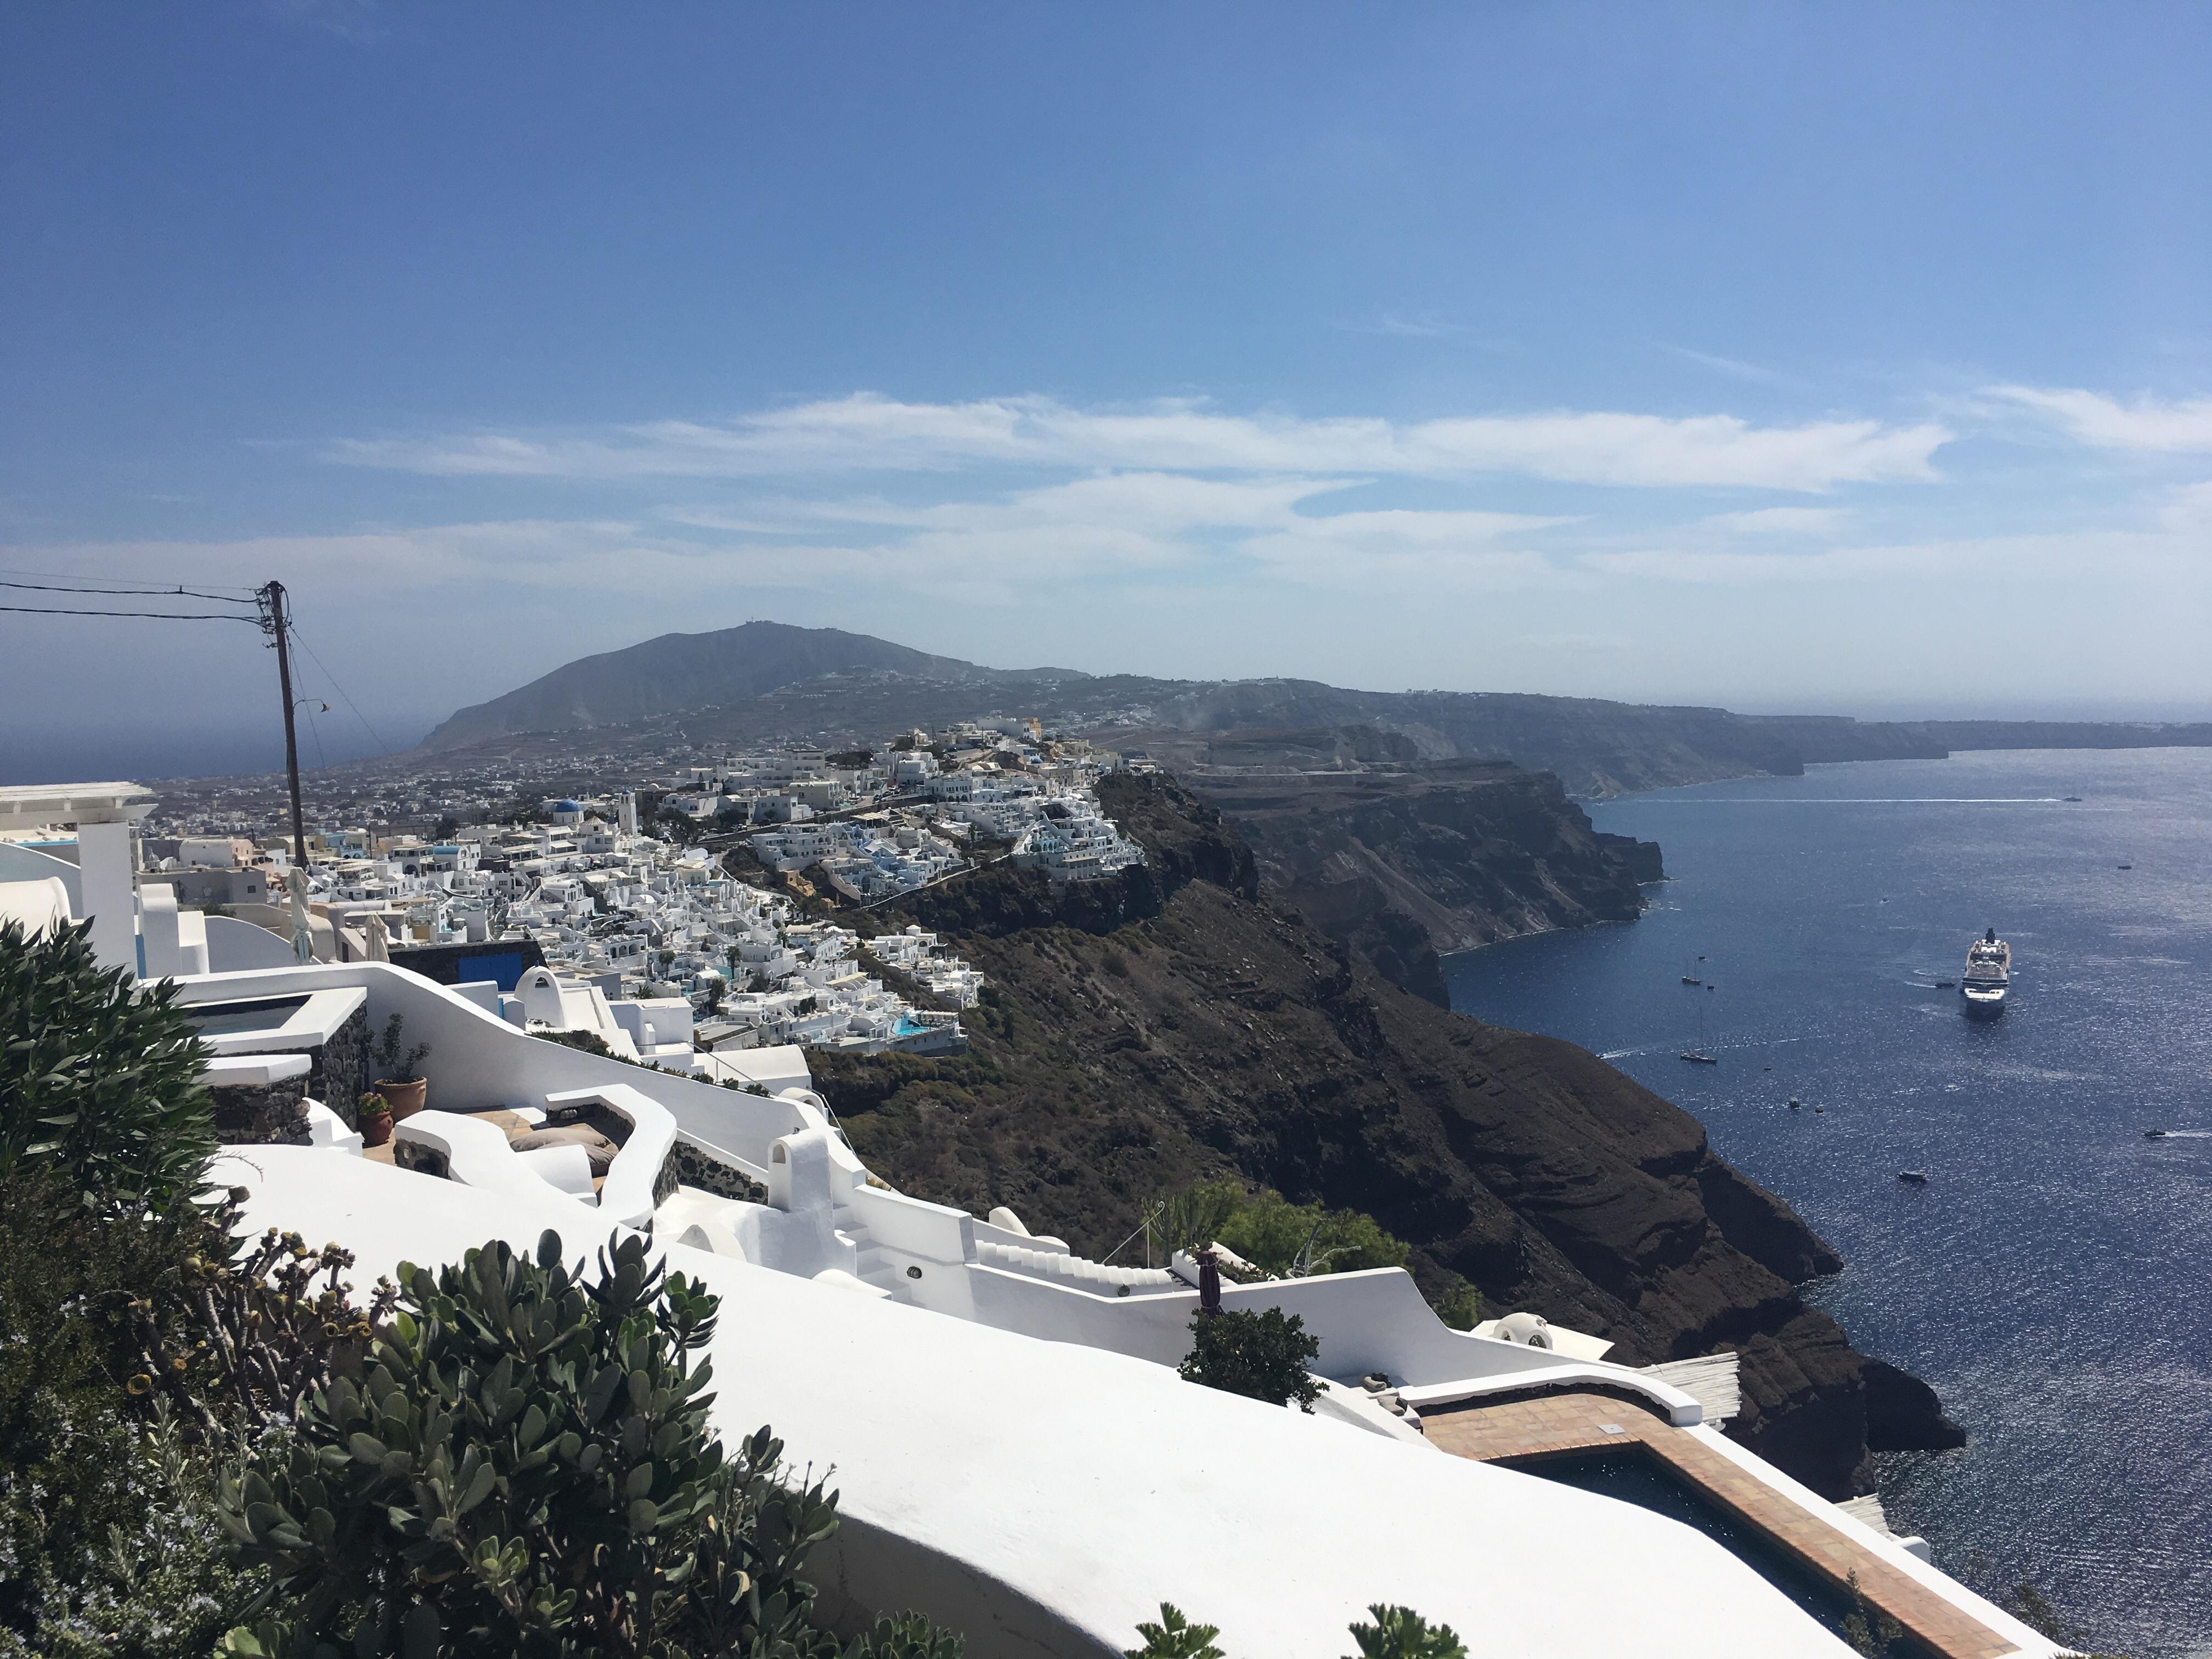 Santorini - panorama from the 'Vasilicos' Hotel down to the caldera.